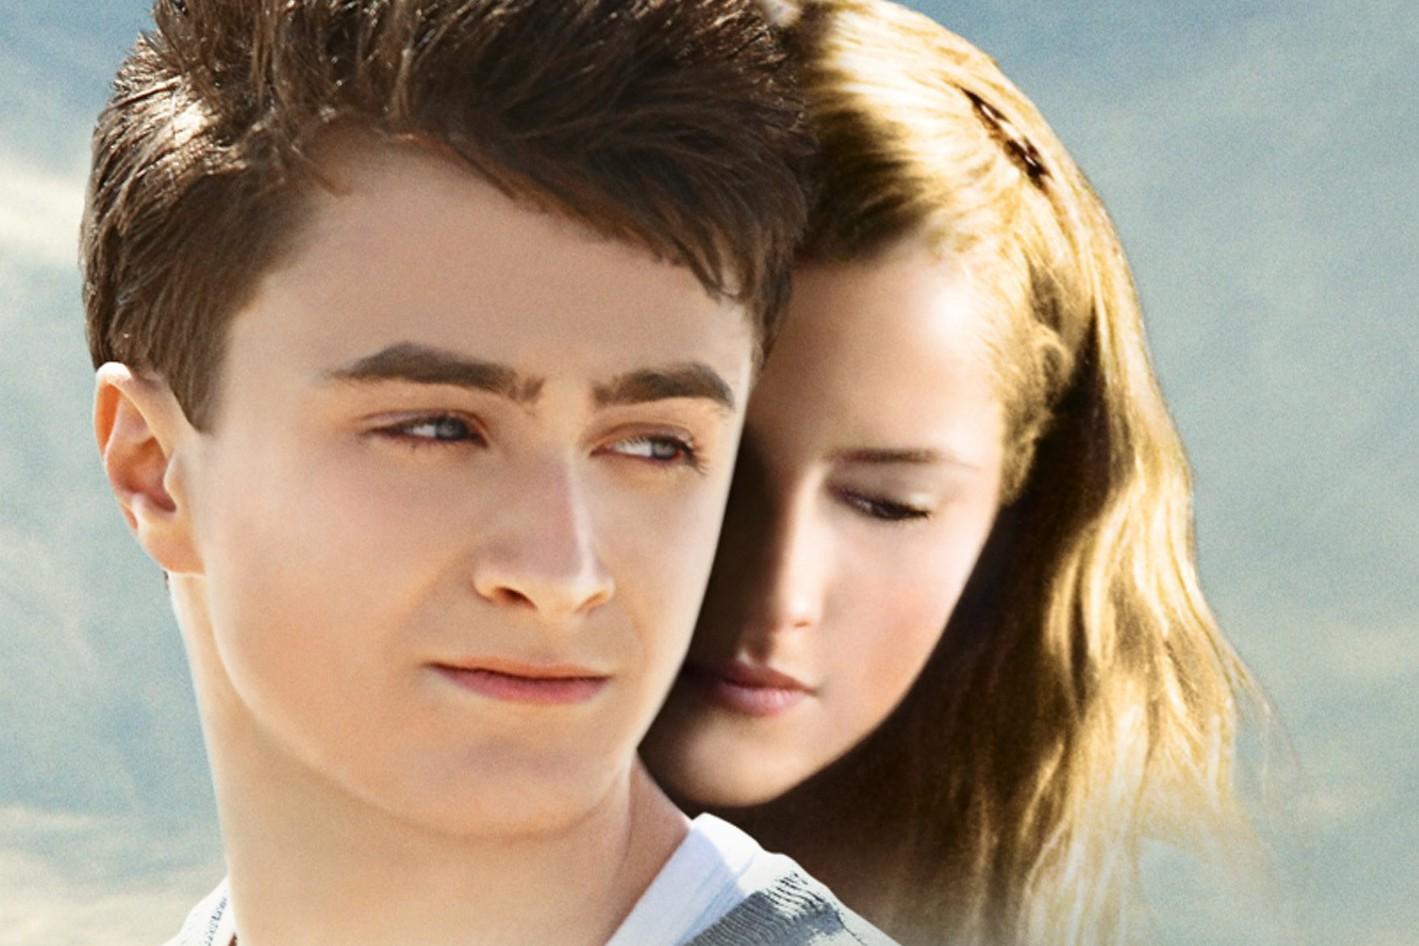 Nggak cuma Harry Potter, 10 film Daniel Radcliffe ini juga seru abis